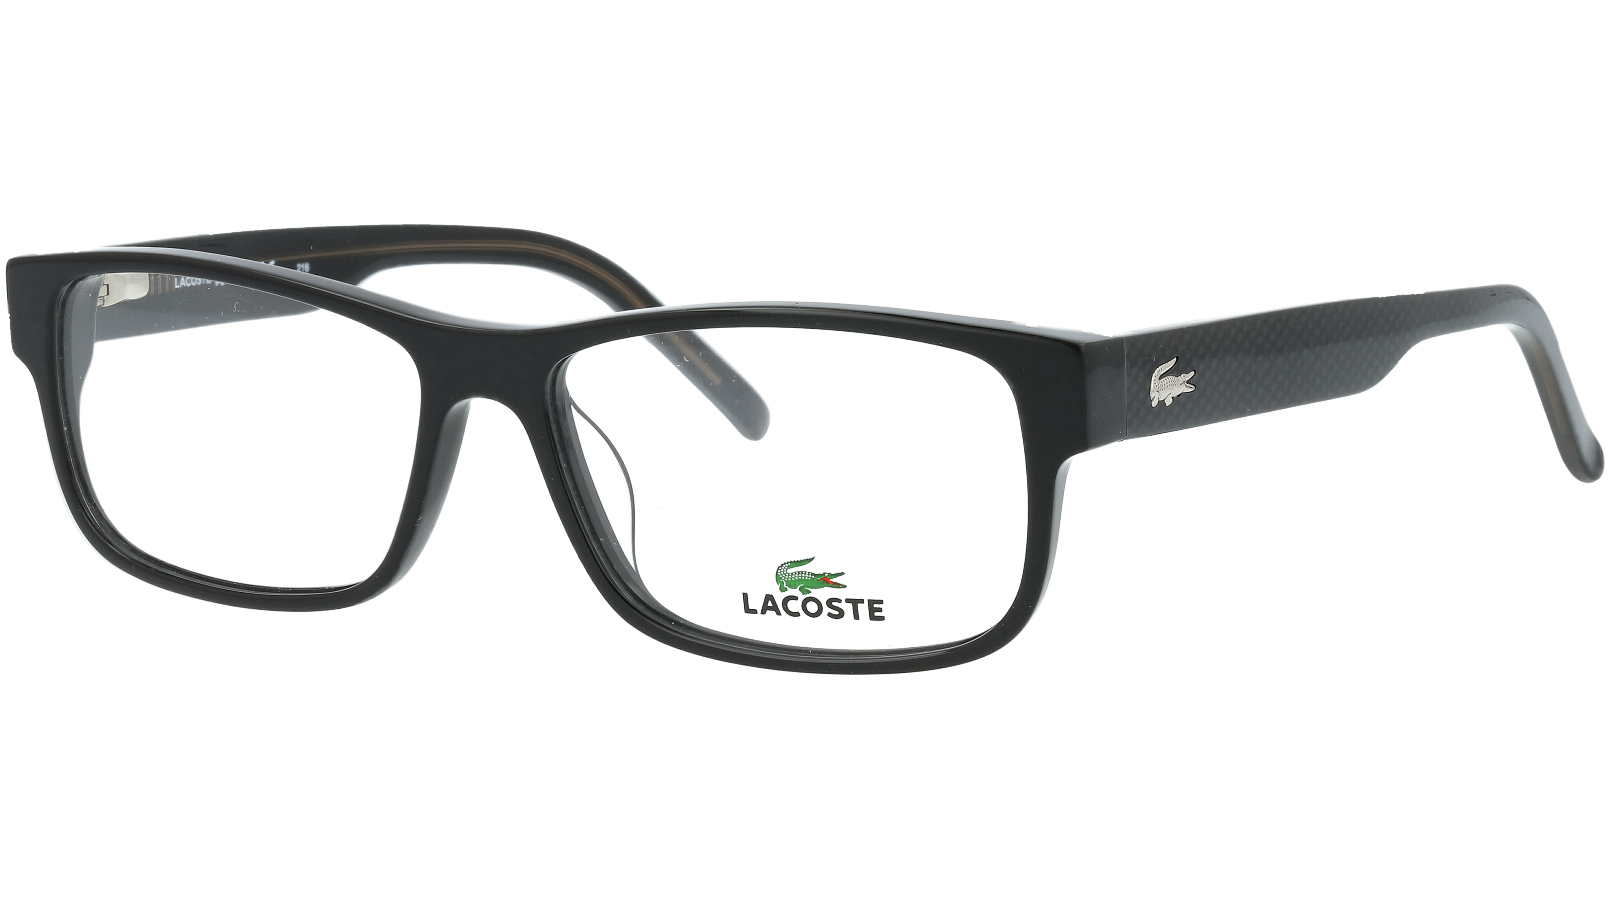 LACOSTE L2660 001 55 BLACK Glasses